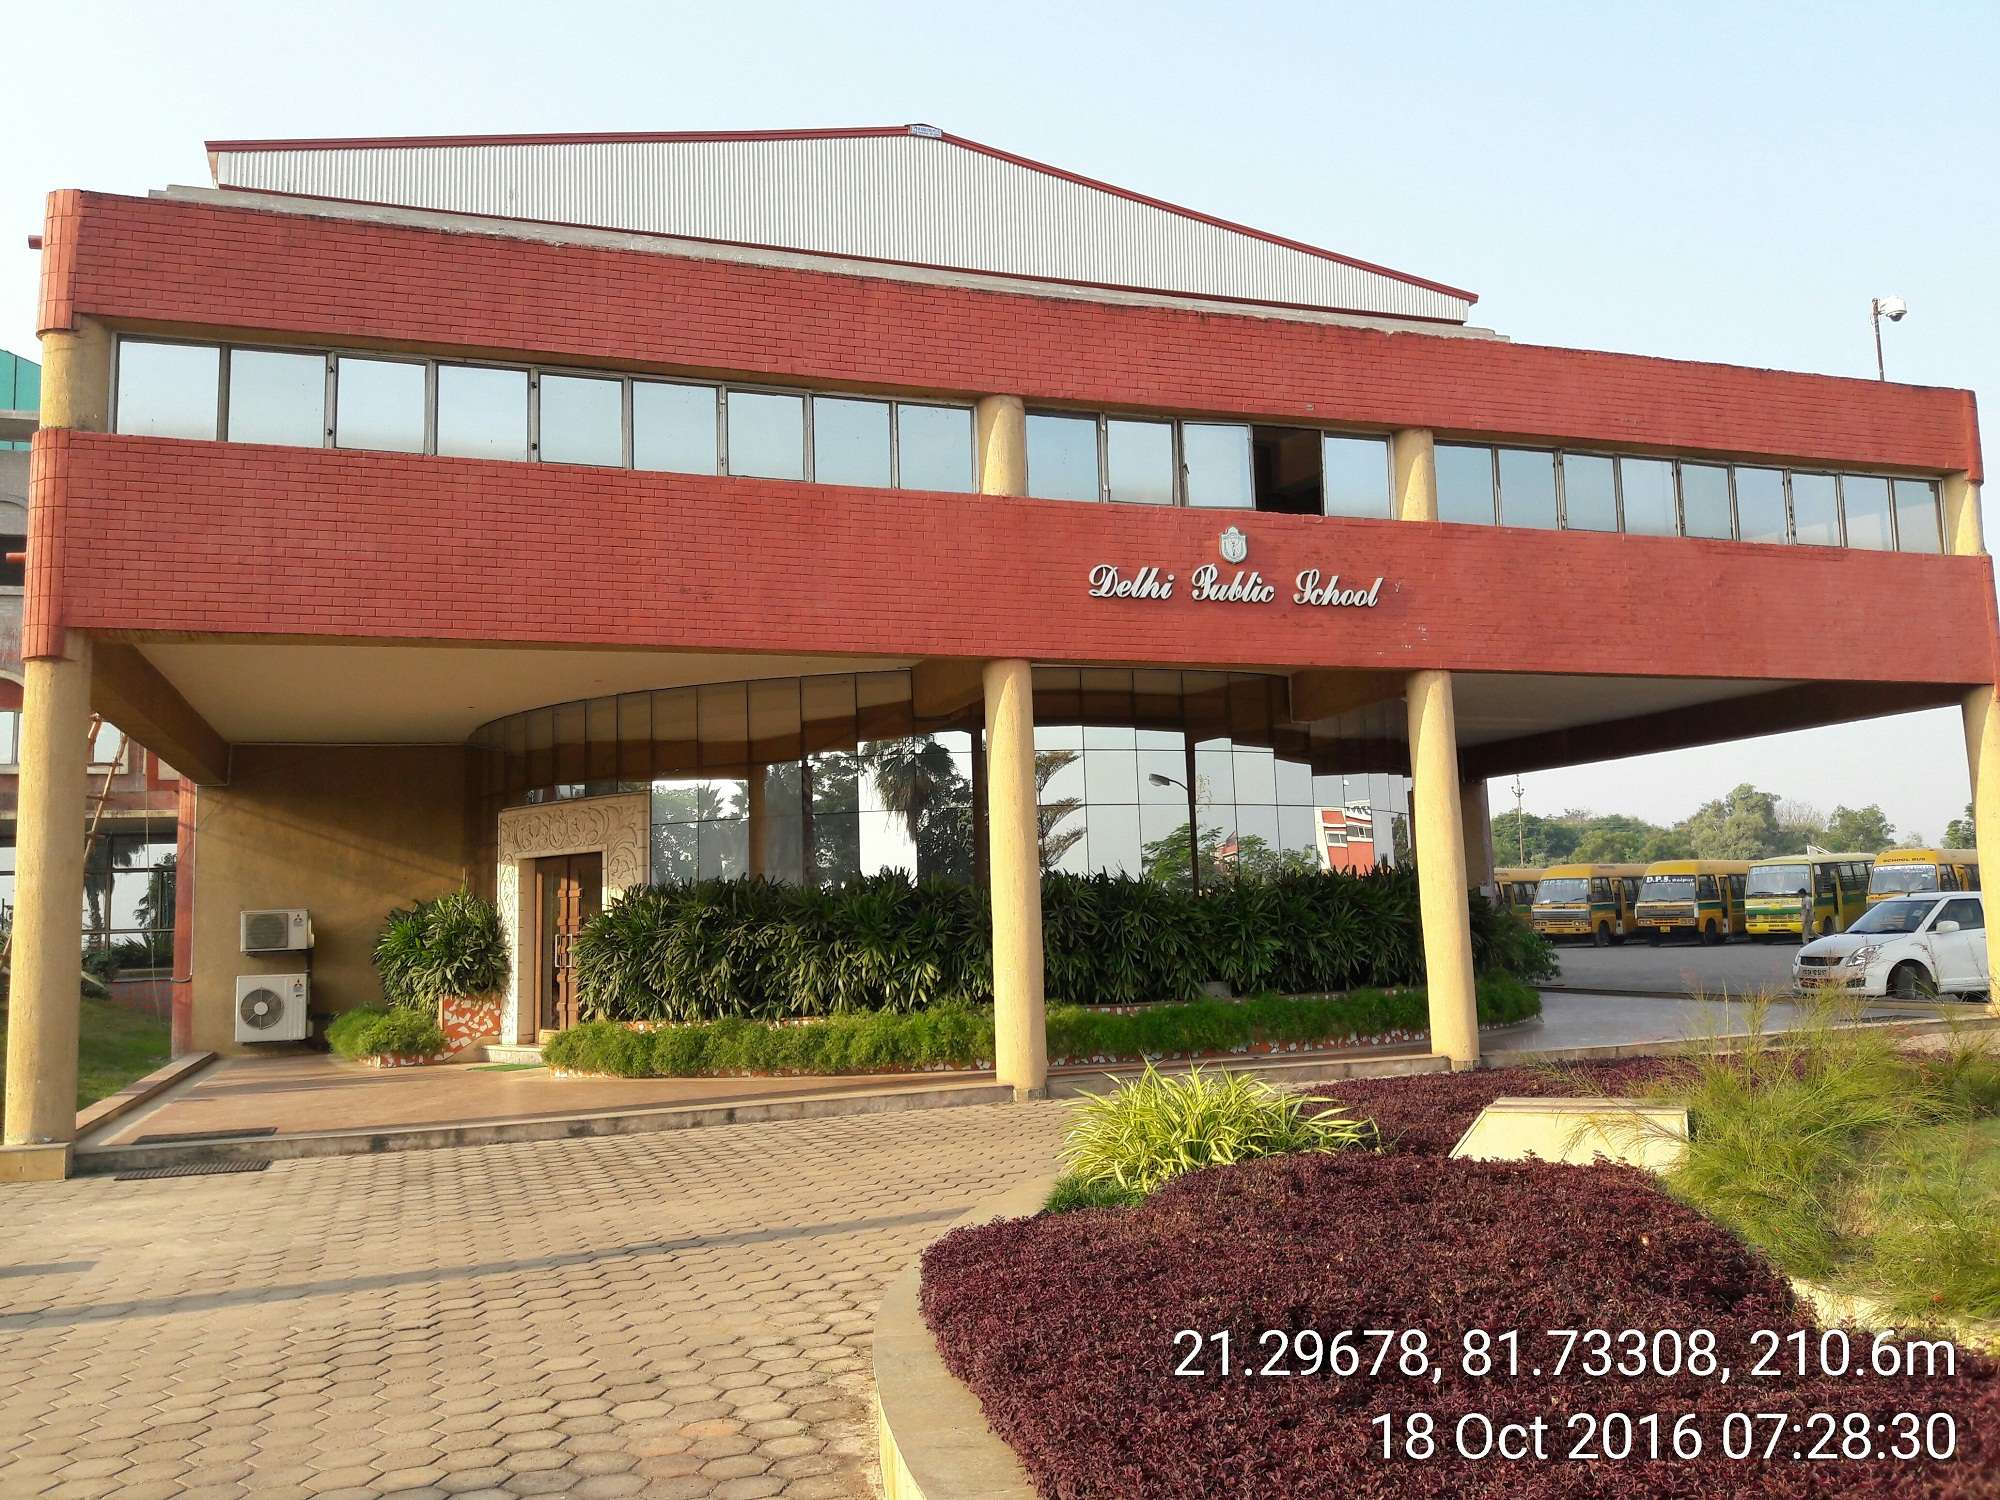 DELHI PUBLIC SCHOOL SEMARIYA BALODA BAZAR ROAD RAIPUR CHHATISGARH 3330076